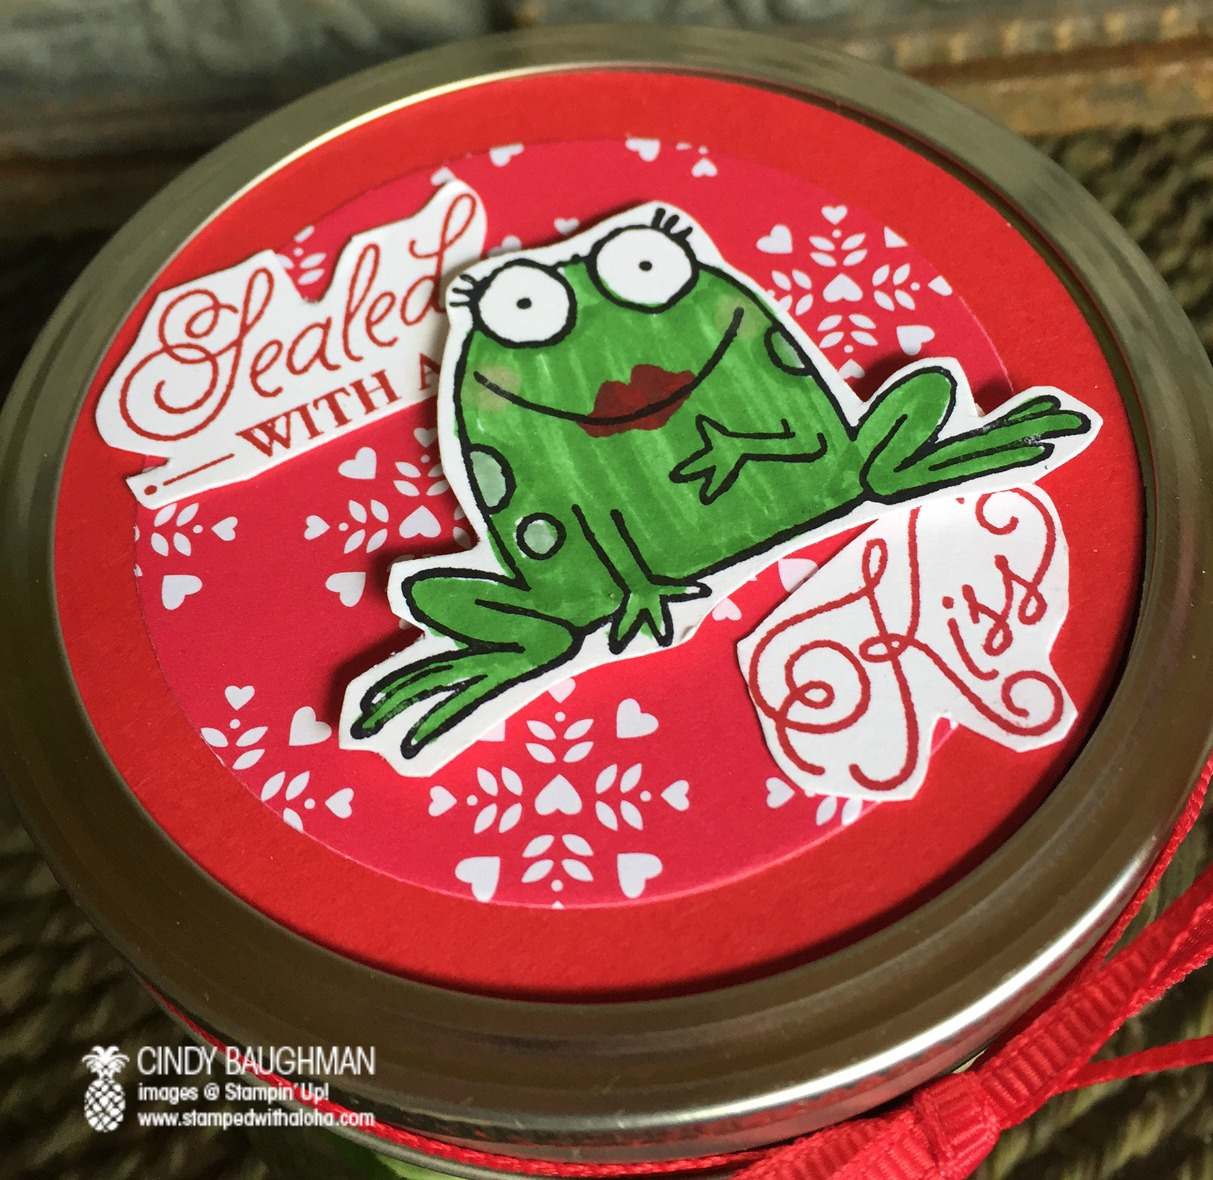 Sealed With a Kiss Gummy Frog Jar - www.stampedwithaloha.com